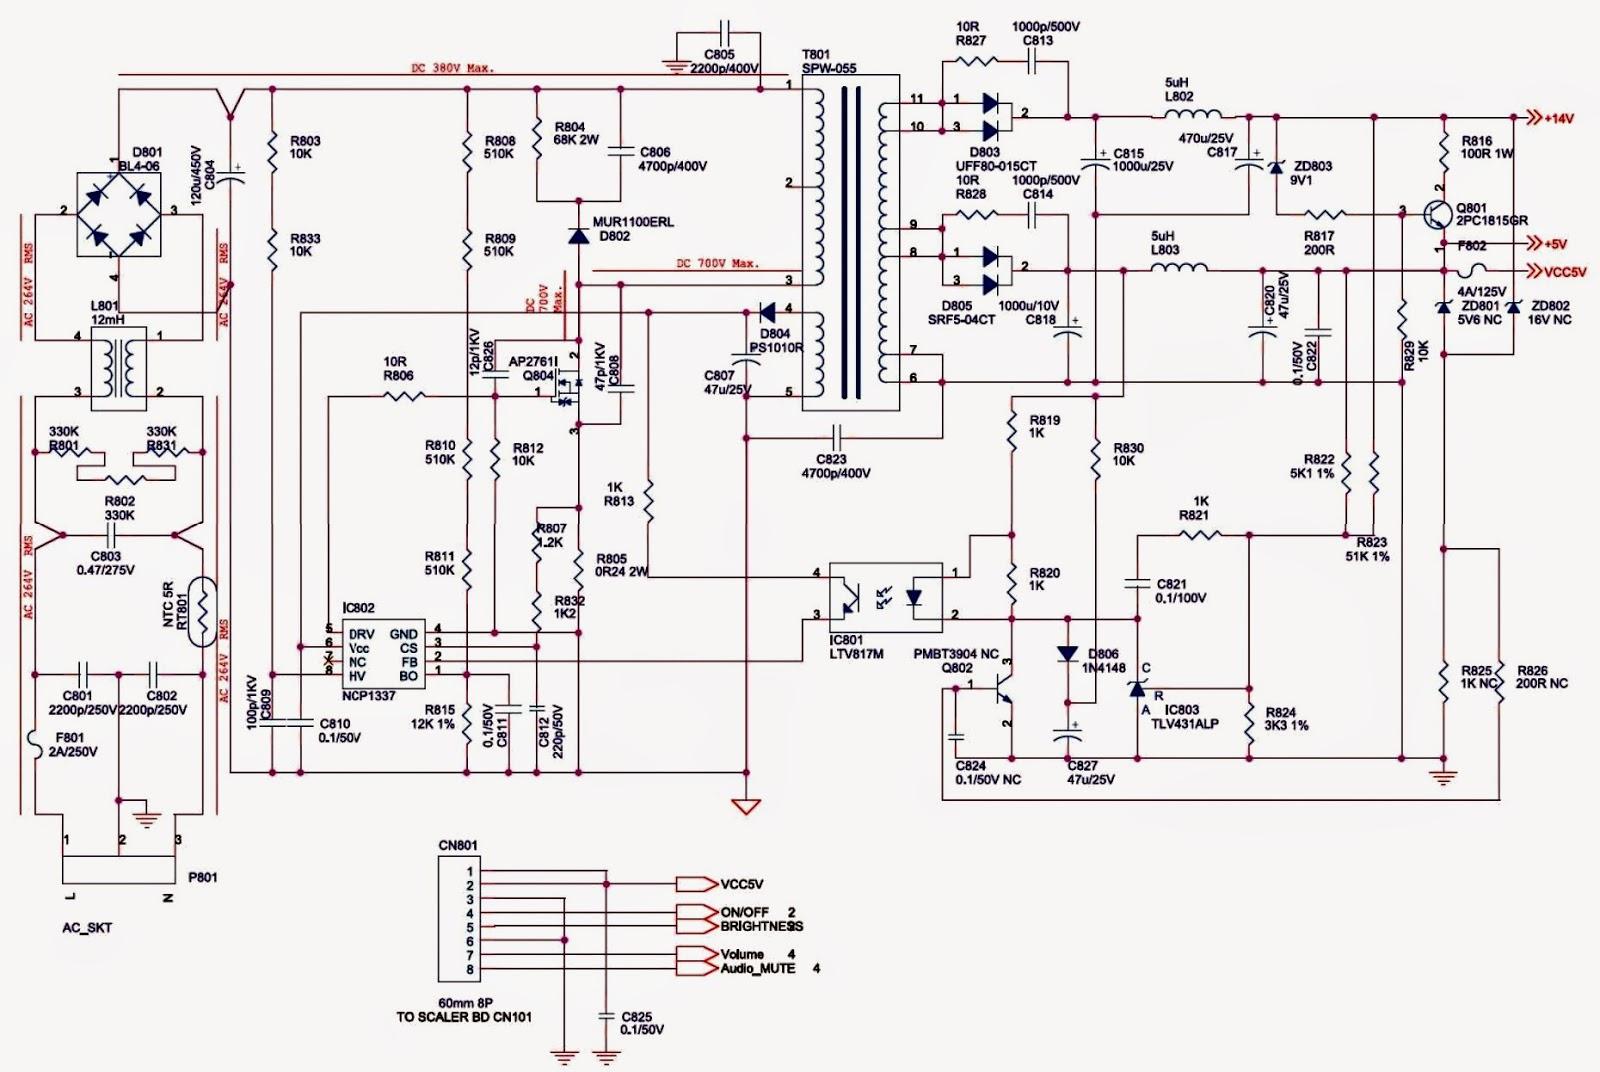 service adjustments main power smps schematic circuit diagram